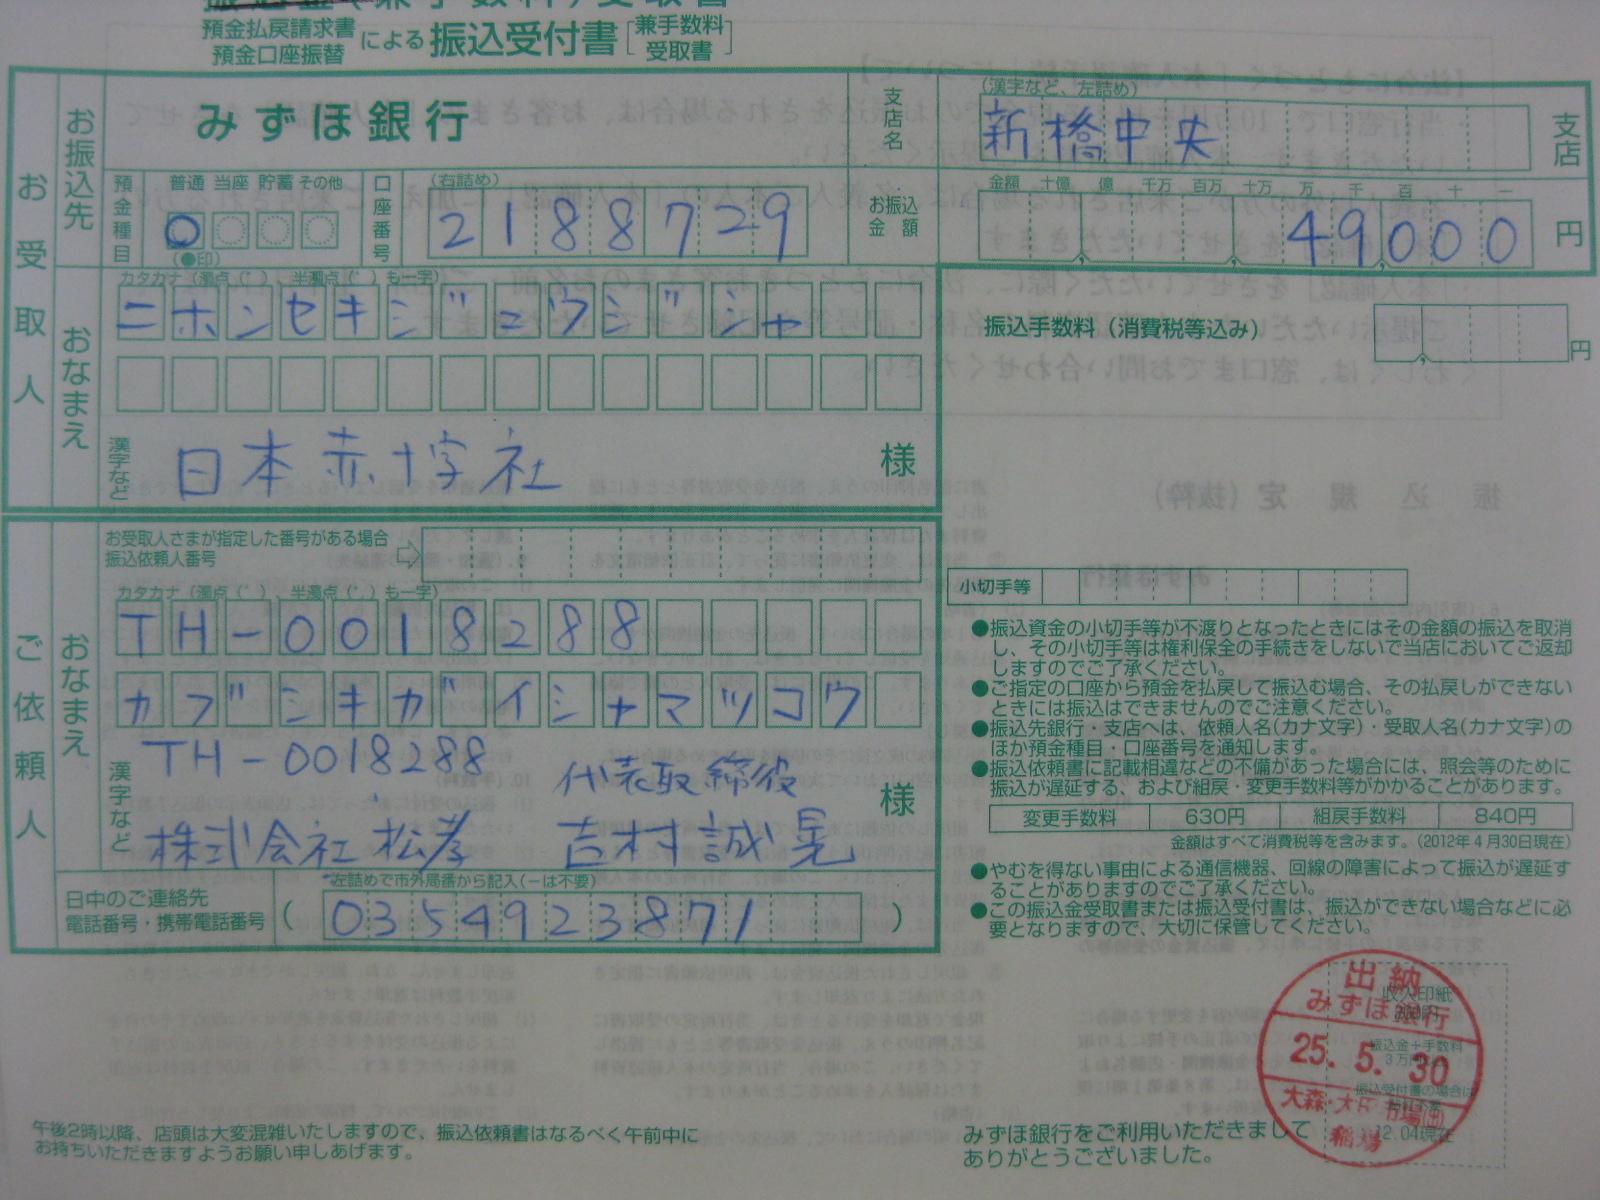 http://www.go-nippon.com/news/images/13%E5%B9%B44%E6%9C%88%E5%88%86.JPG